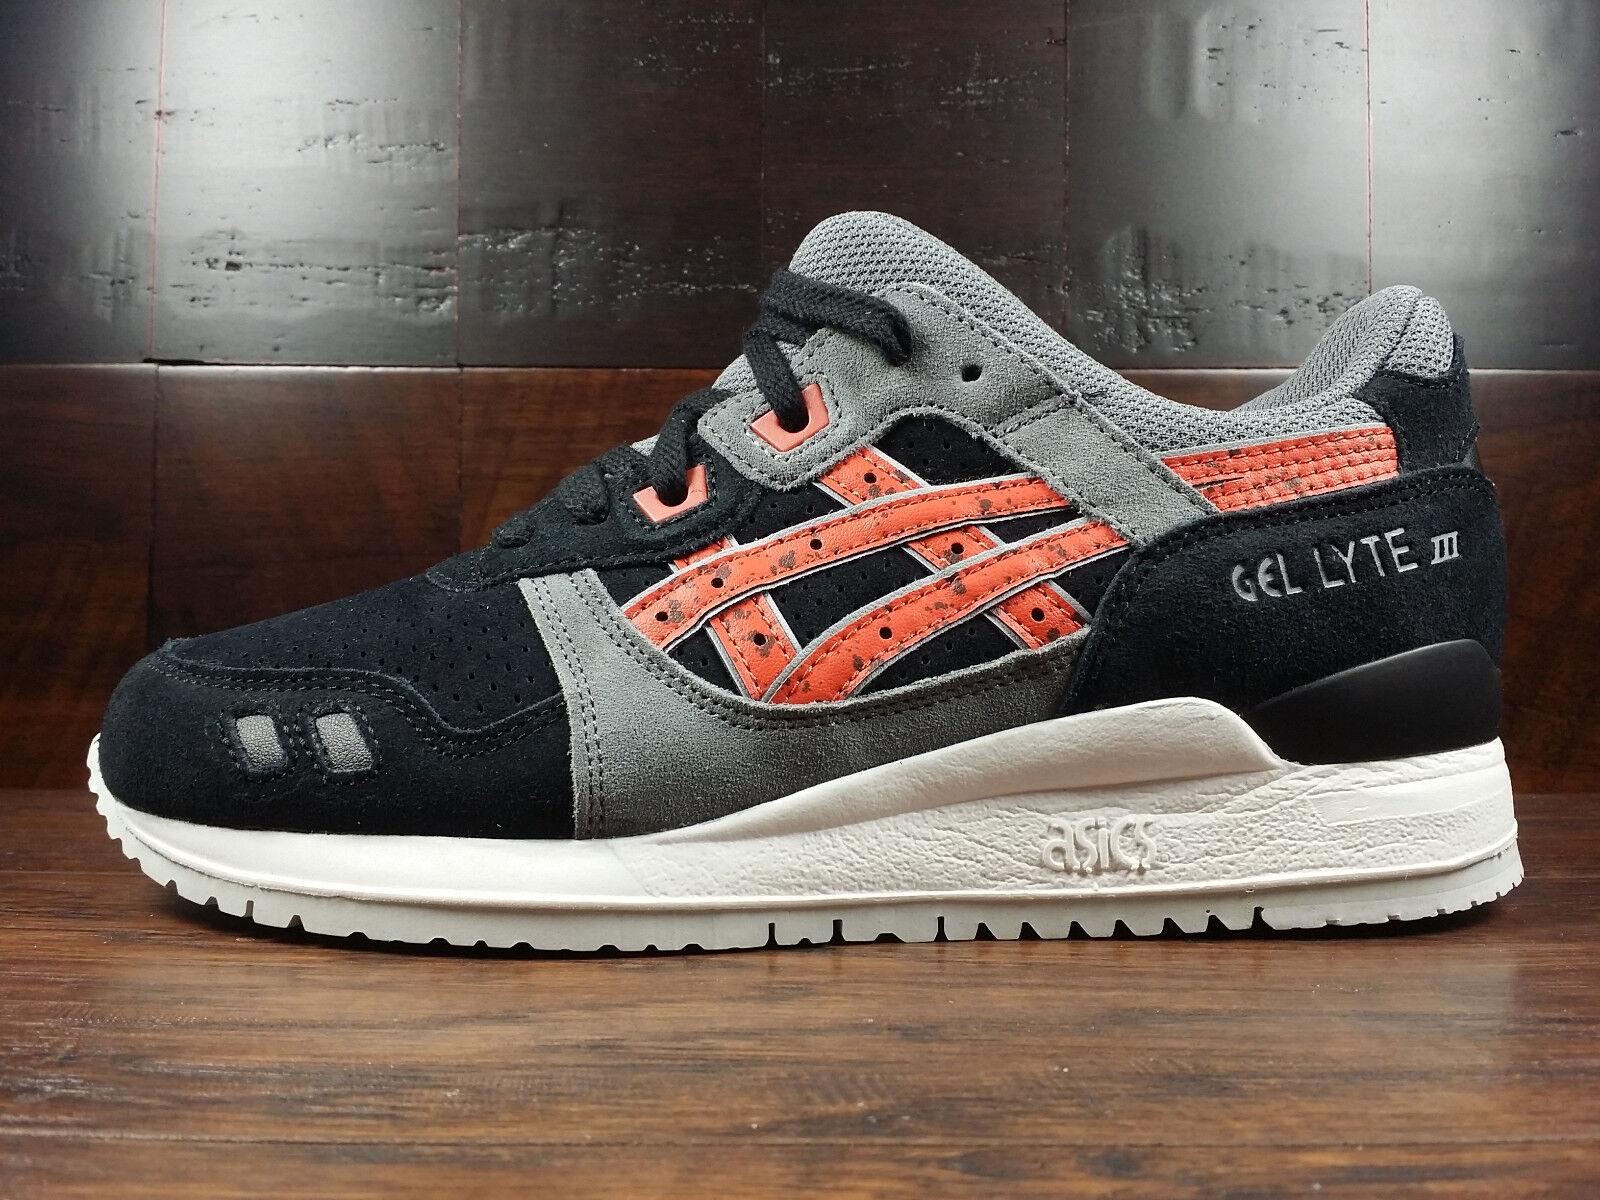 Asics GEL-LYTE 3 III (Black / Chili Red) [H6B2L-9024] Granite Pack Running Mens